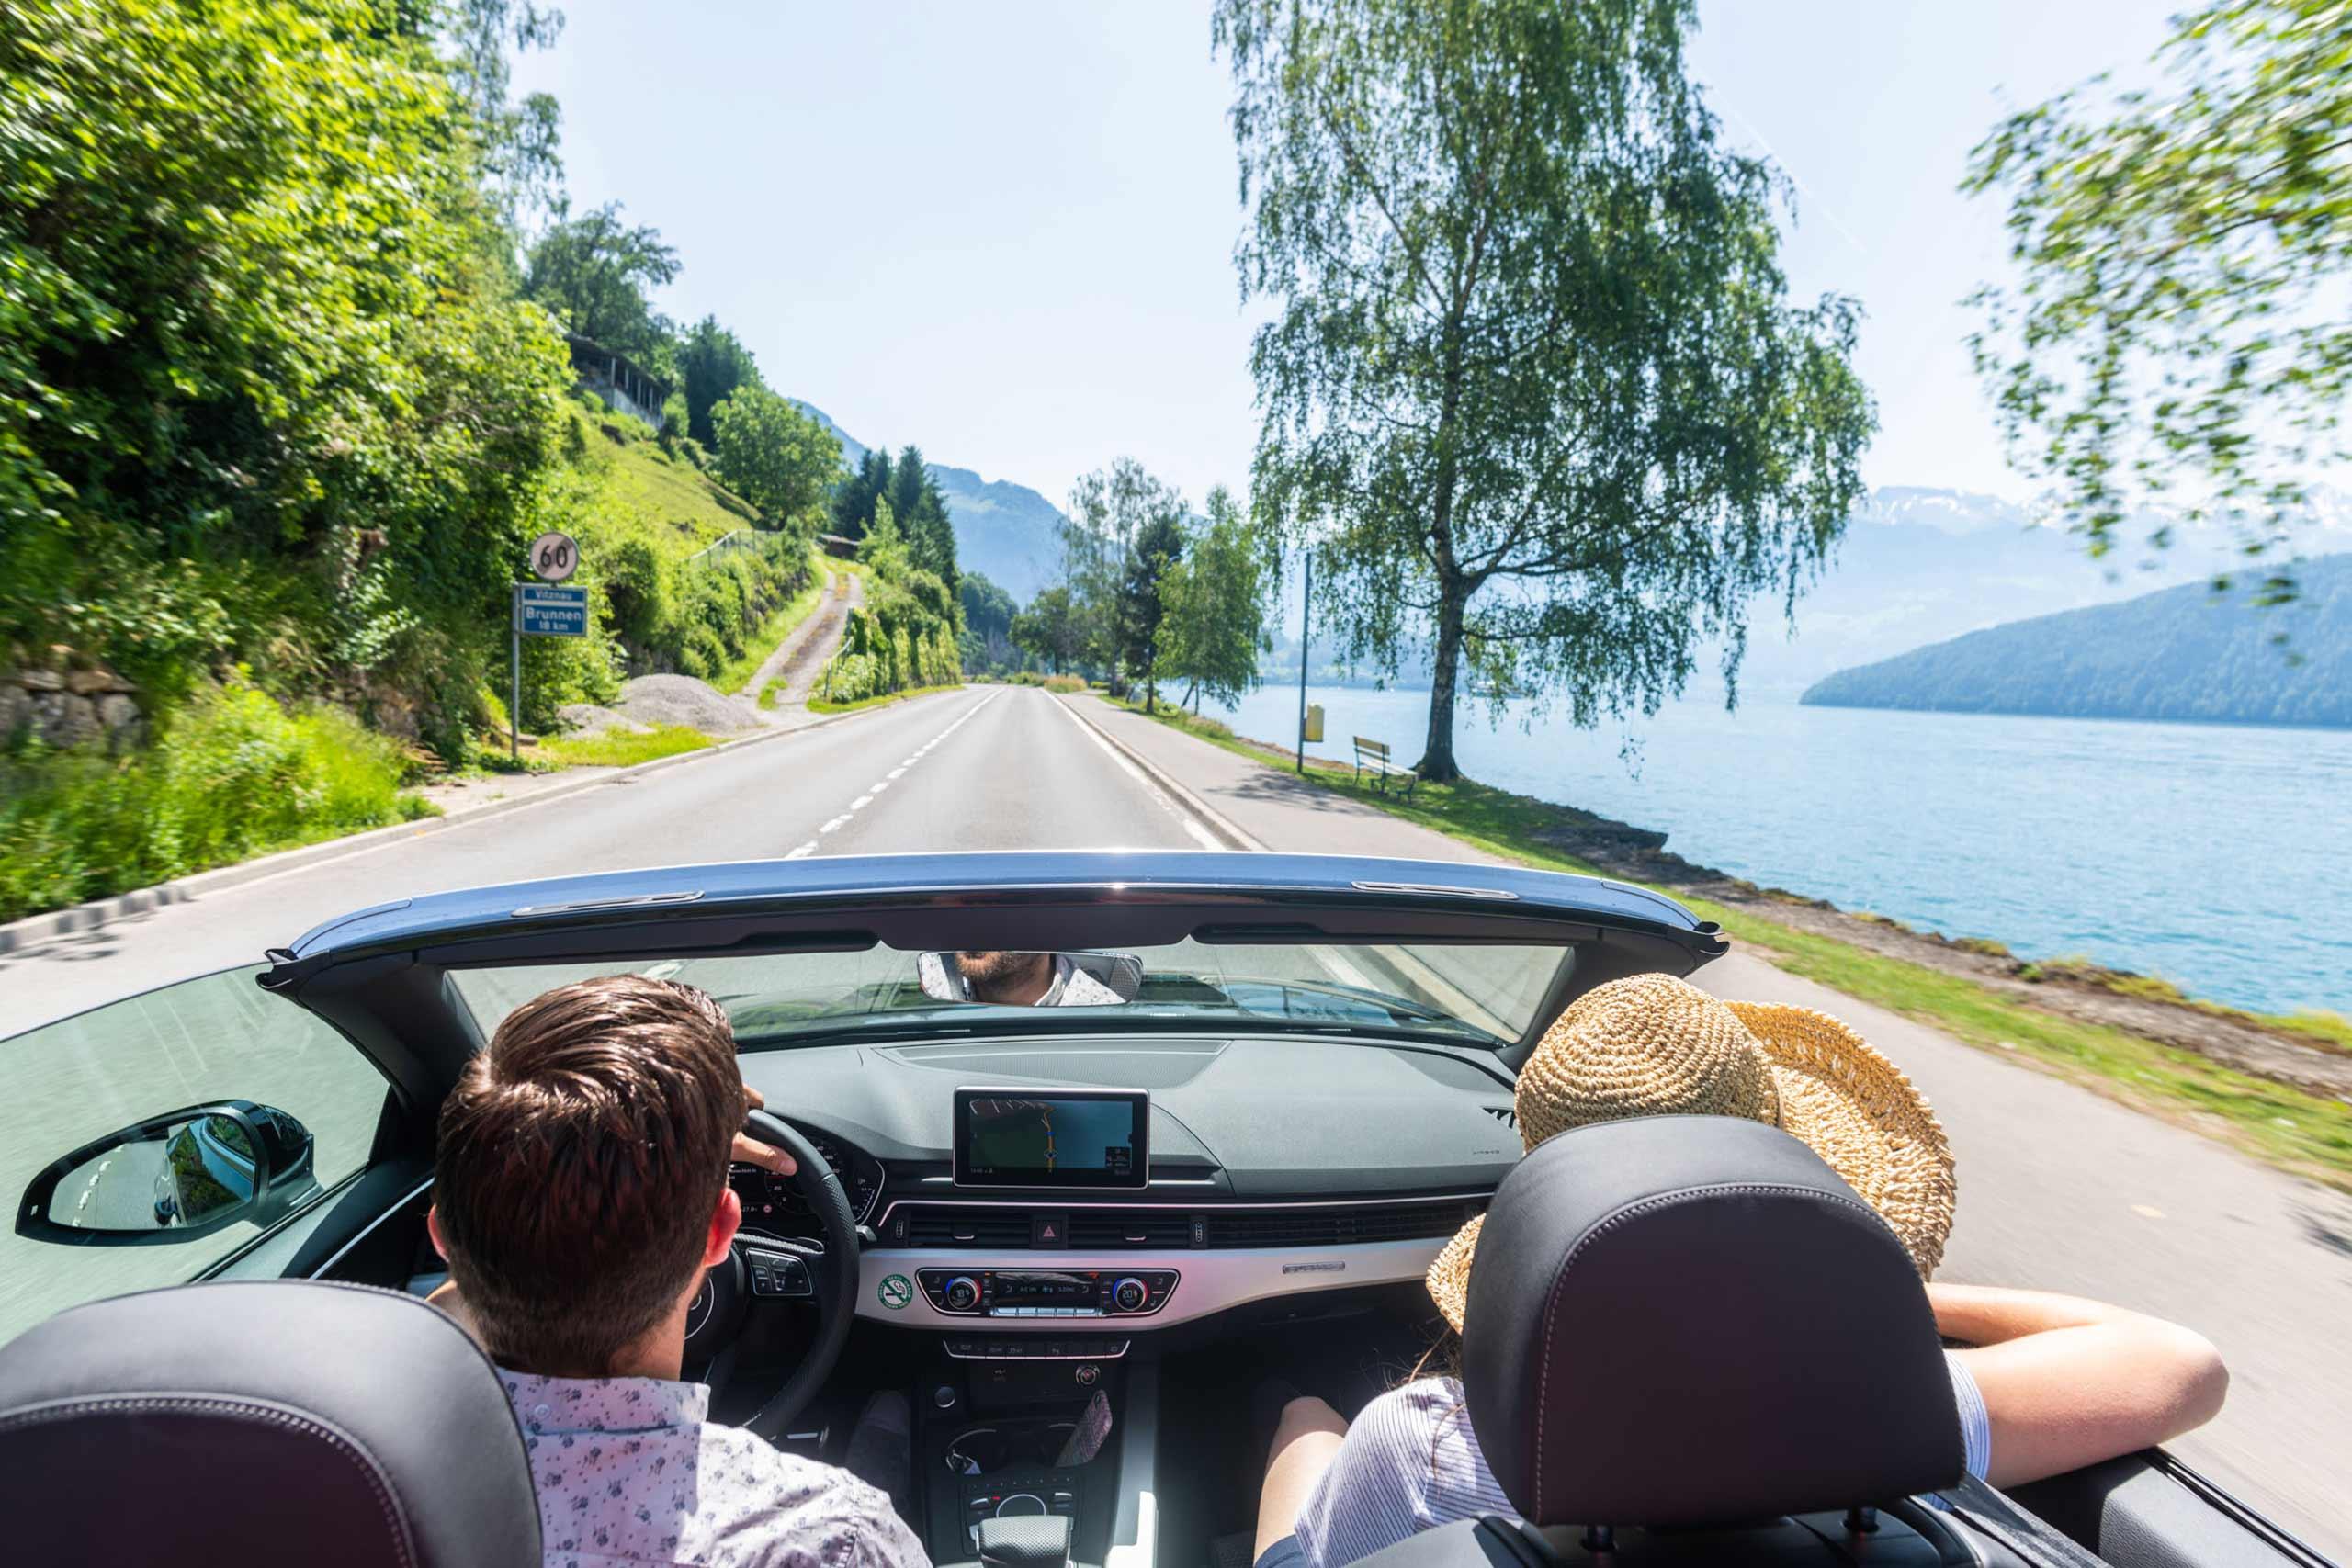 europcar-cabriolet-fahrt-am-see-entlang.jpg